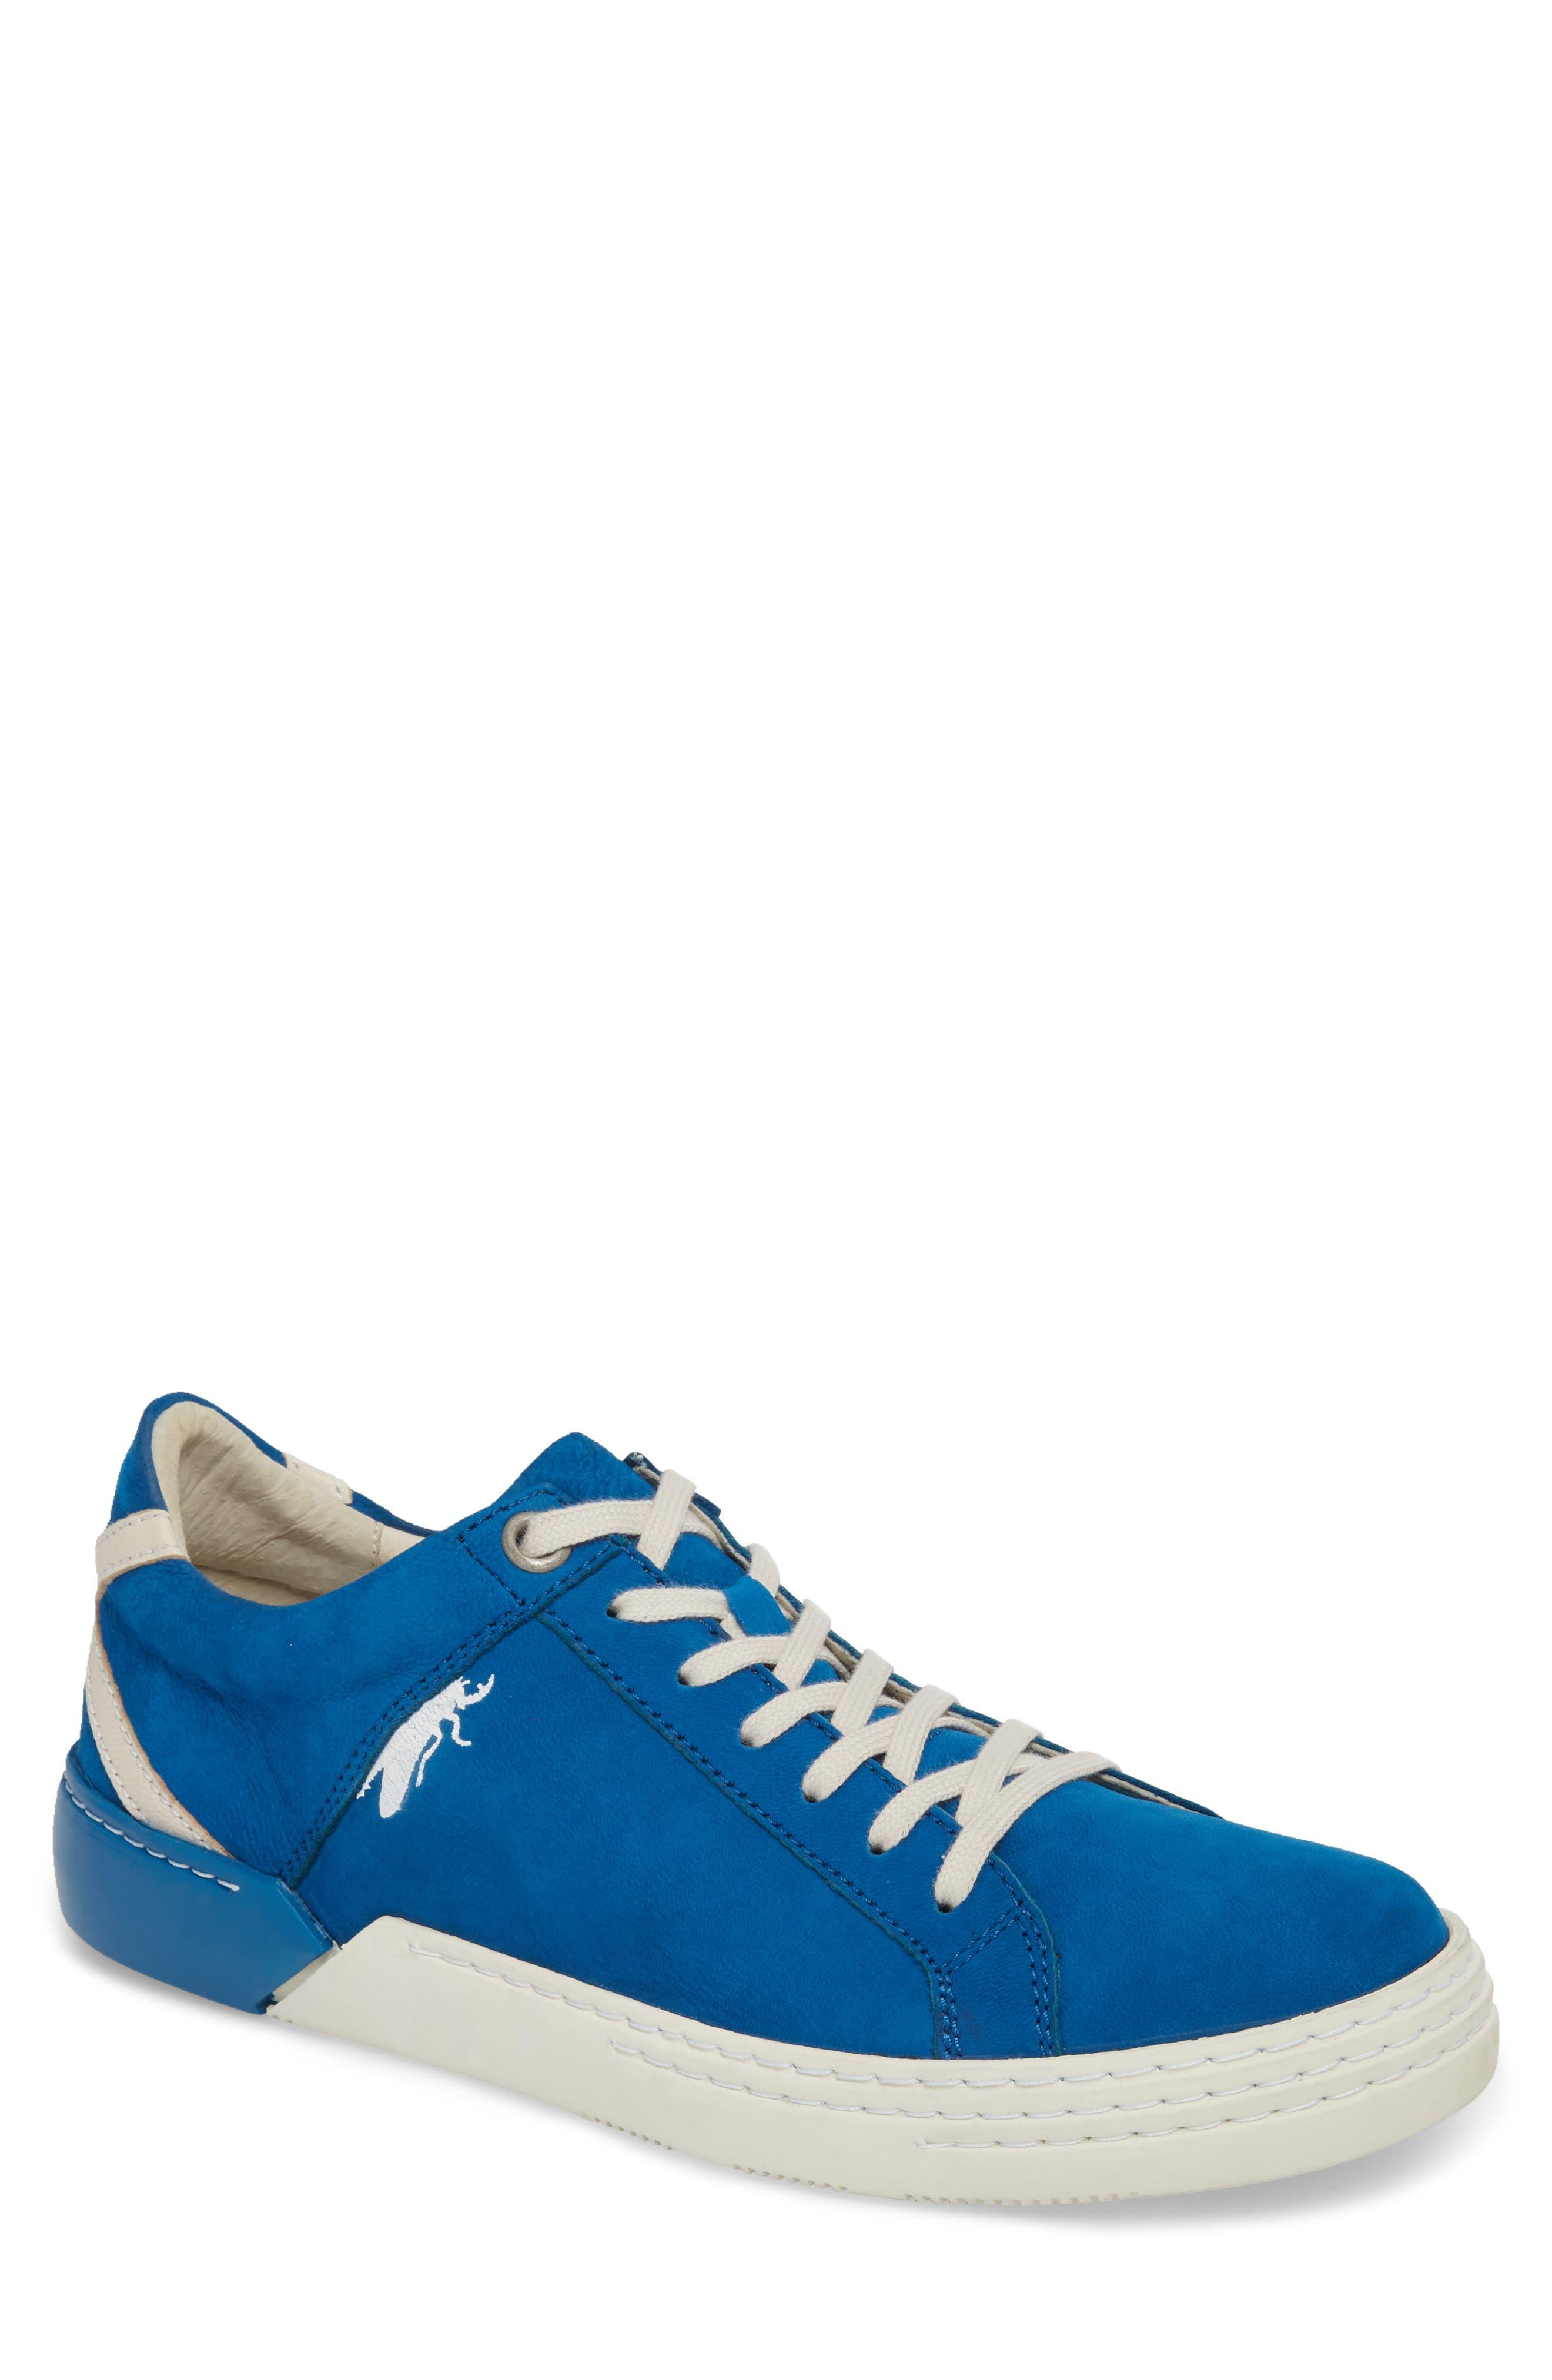 Sene Low Top Sneaker,                             Main thumbnail 1, color,                             ELECTRIC BLUE LEATHER